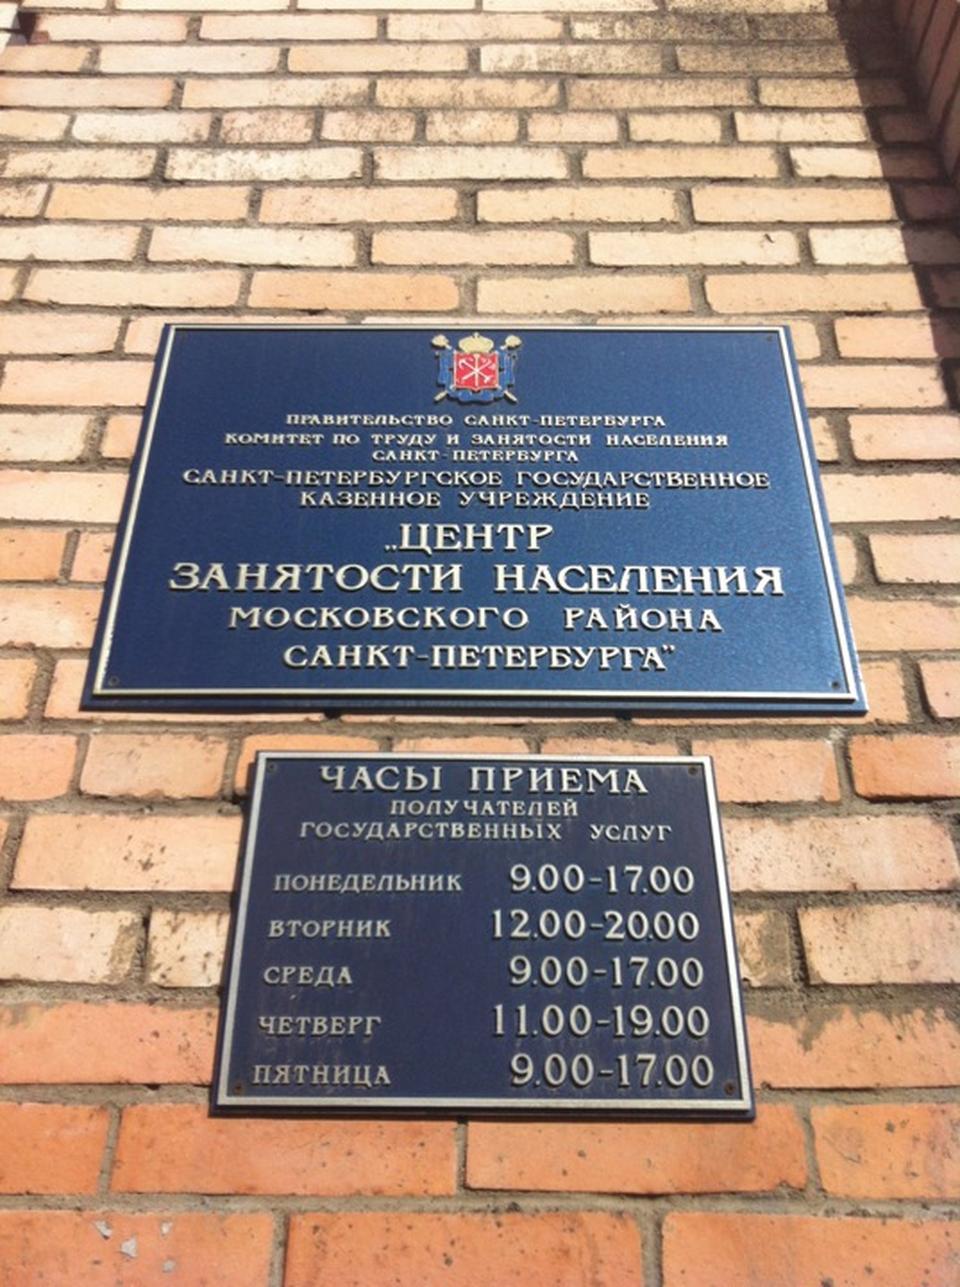 центр занятости московского района спб фото смотрела